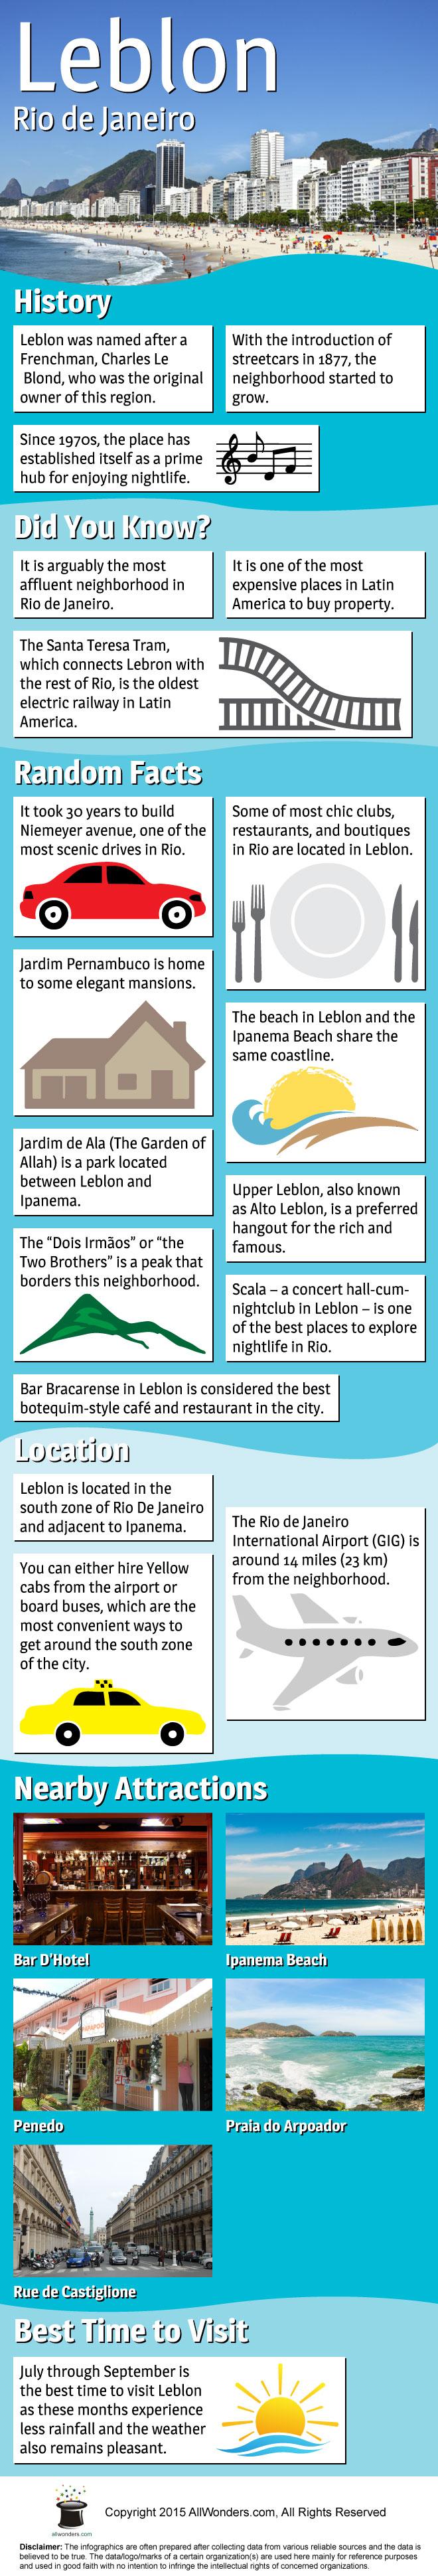 Leblon Infographic